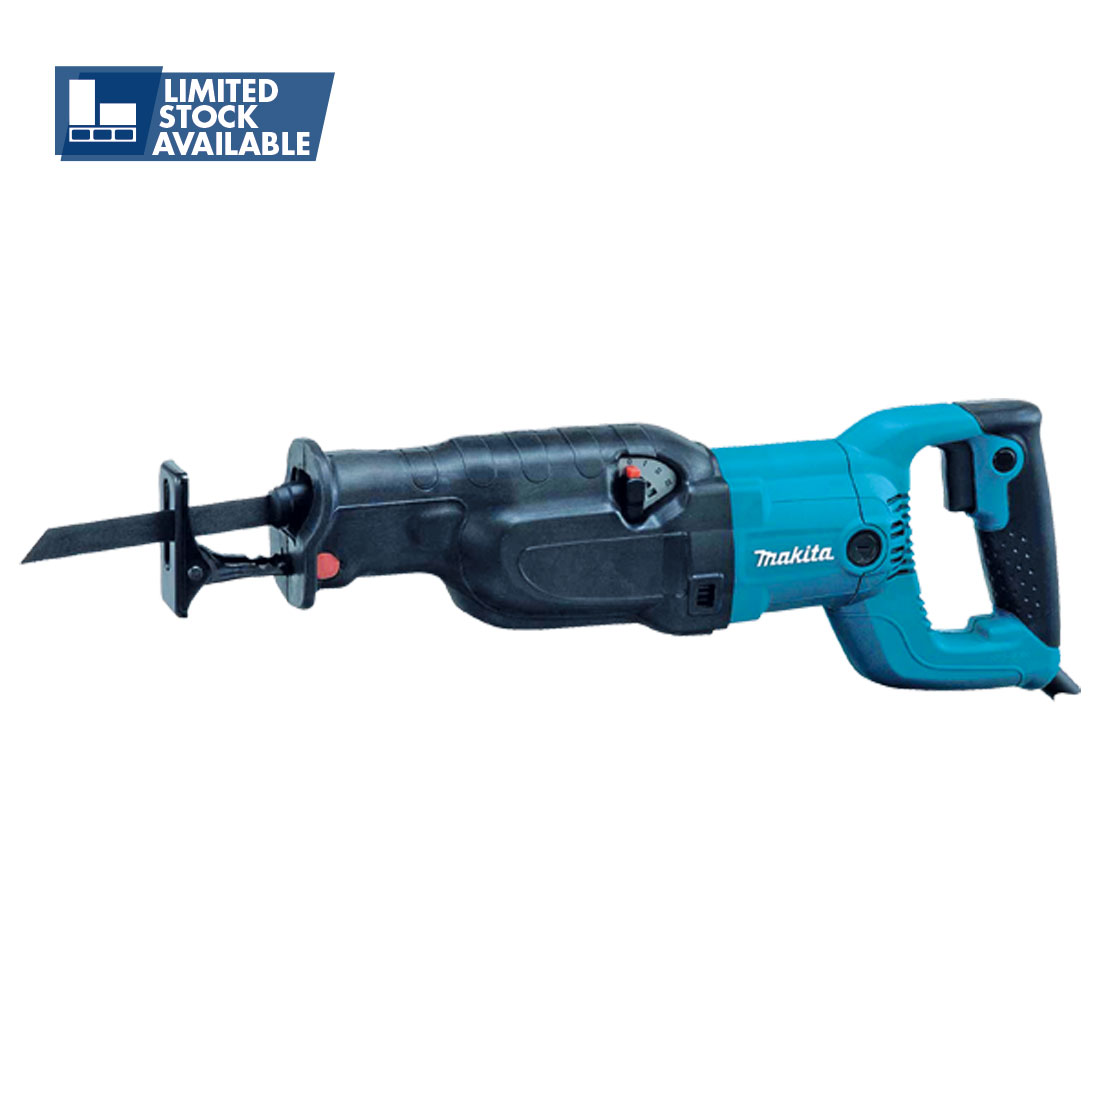 1250W 28mm Stroke Reciprocating Saw